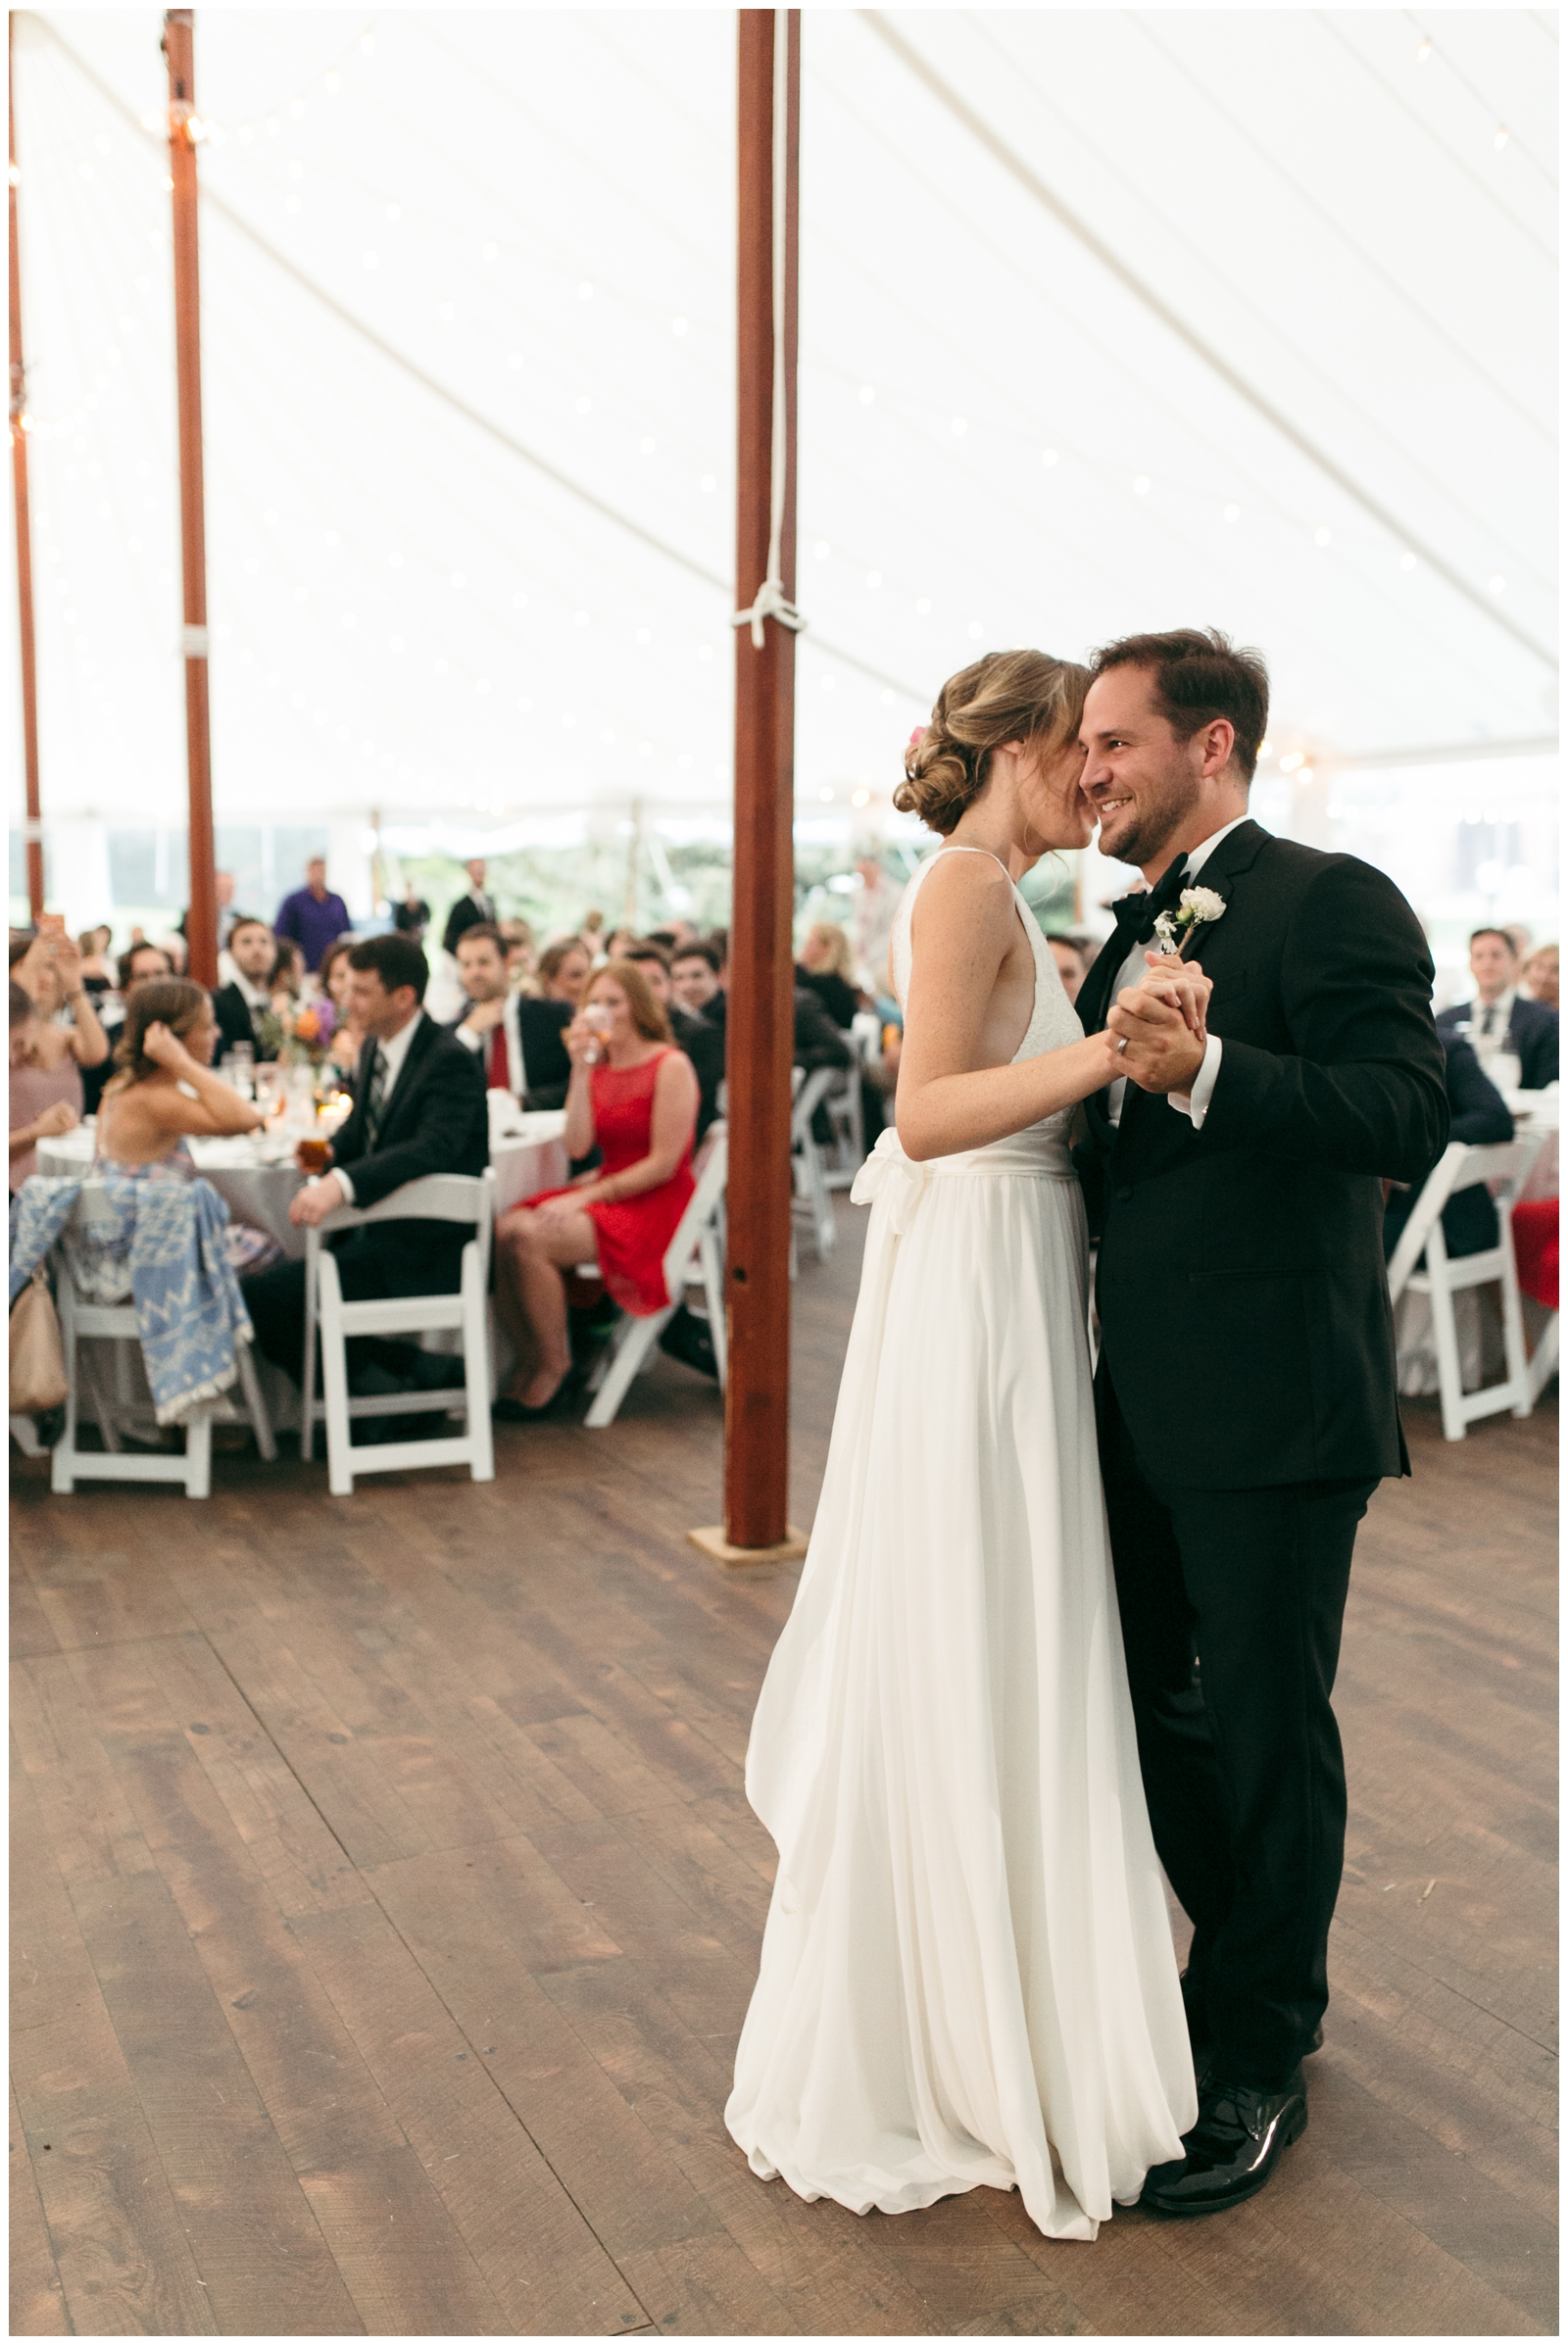 Moraine-Farm-wedding-Bailey-Q-Photo-Massachusetts-wedding-photpgrapher-116.jpg